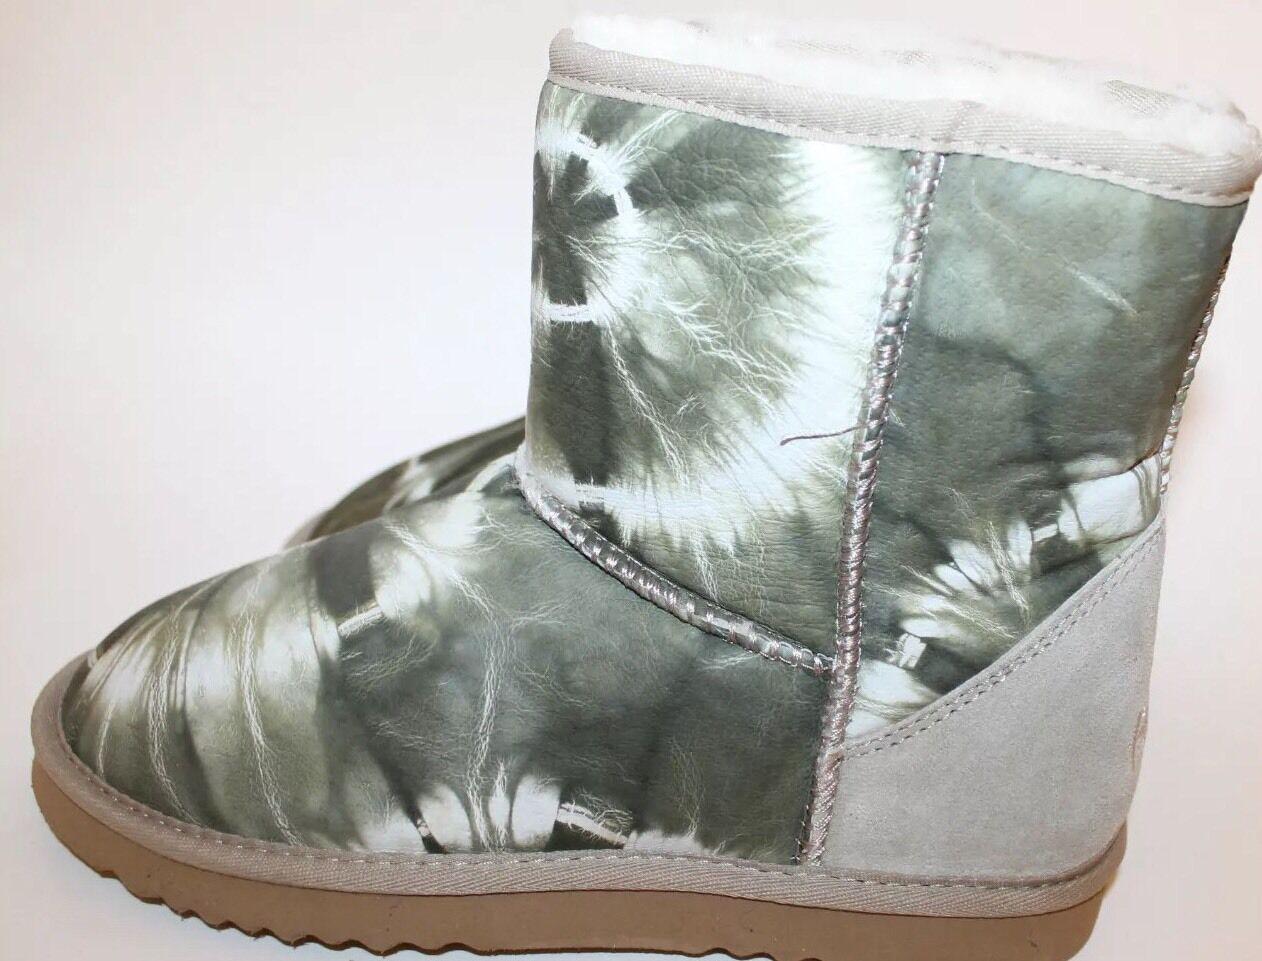 NWT Flurries Tye Dye Print Leather Boots Winter Sz 7 Sheep Skin Lining Women